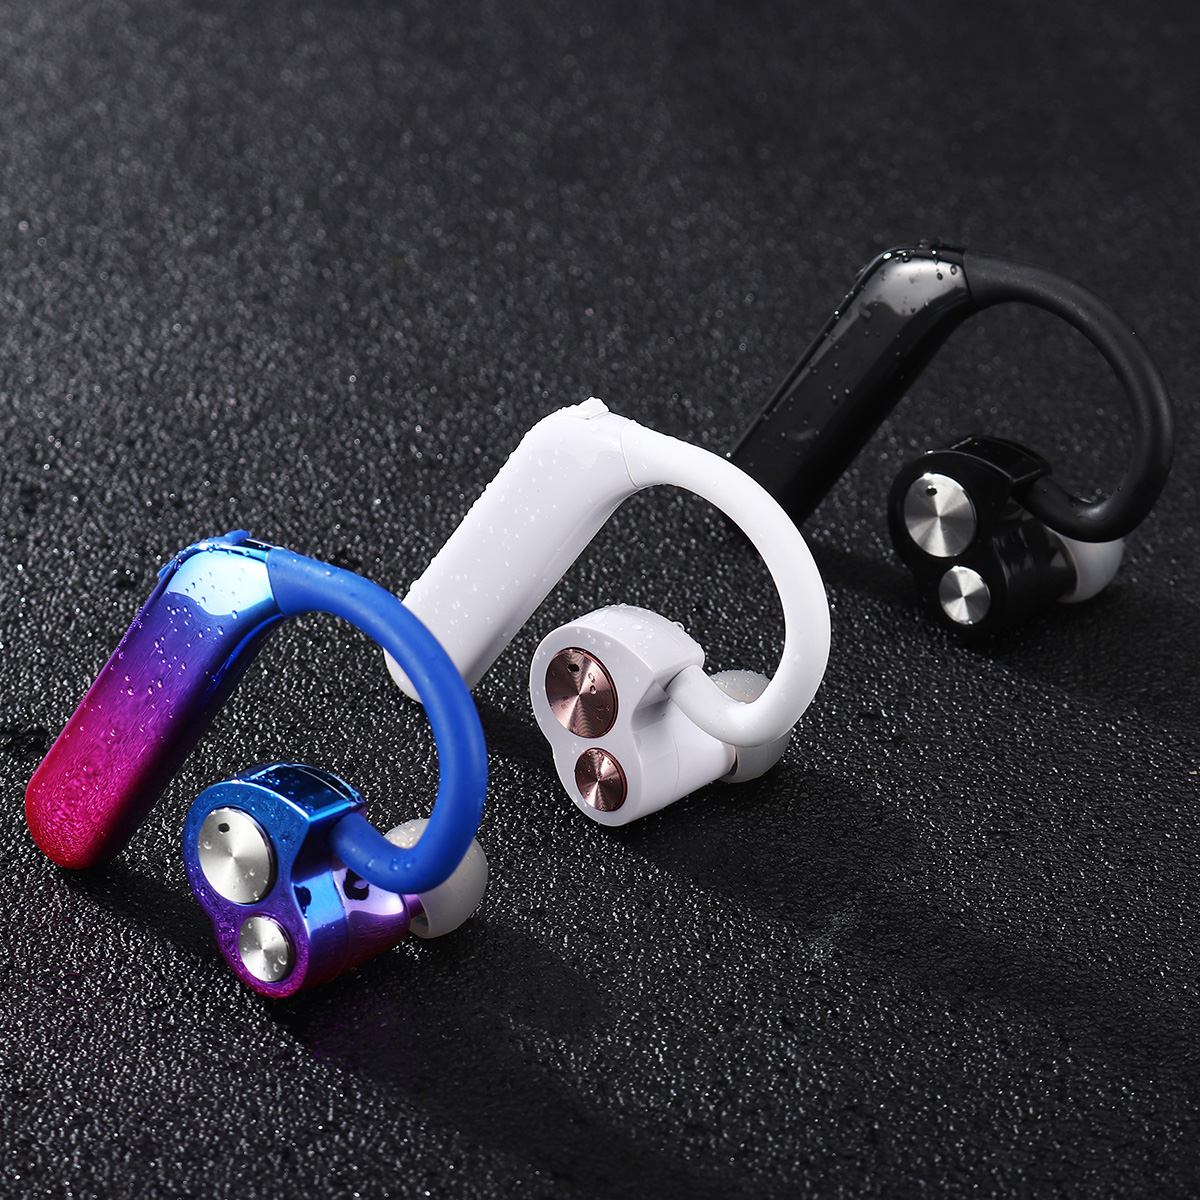 [True Wireless] bluetooth 5.0 TWS Earbuds Binaural Stereo IPX7 Waterproof Noise Reduction Handsfree Dual Dynamic Earphone With Mic